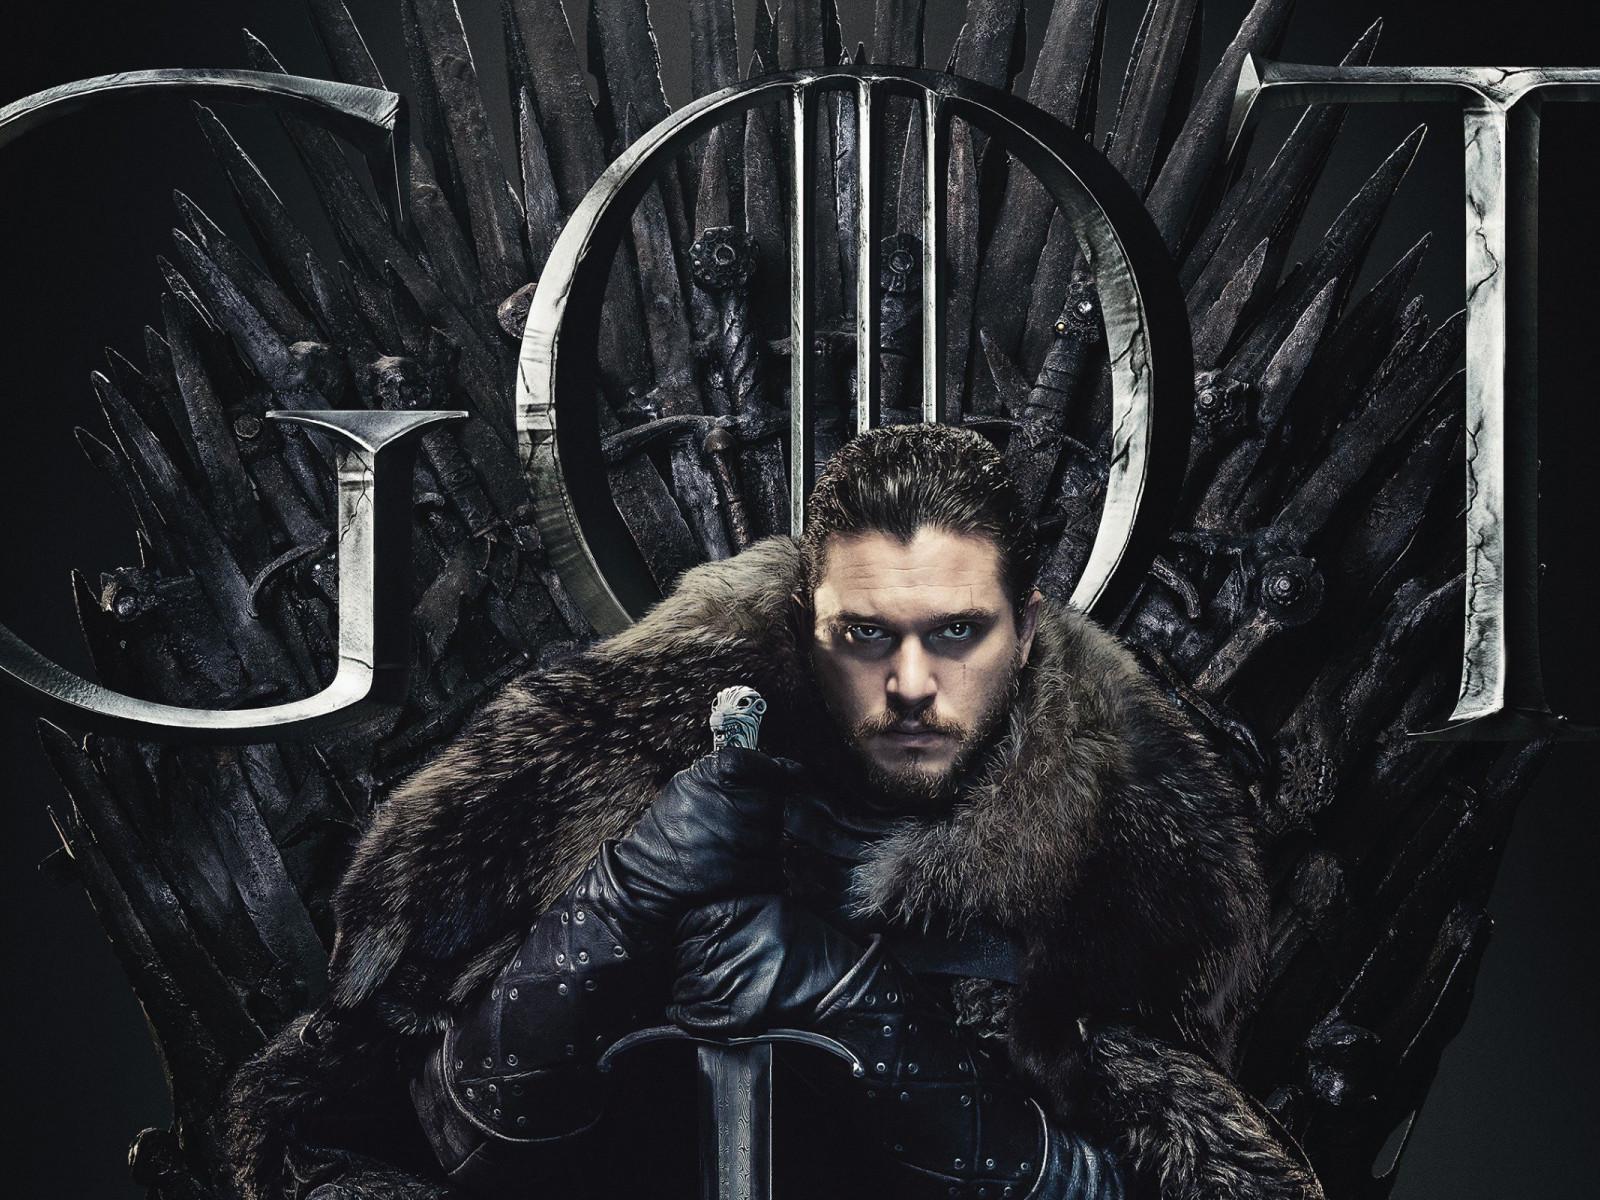 Download Wallpaper: Game Of Thrones 8 1600x1200